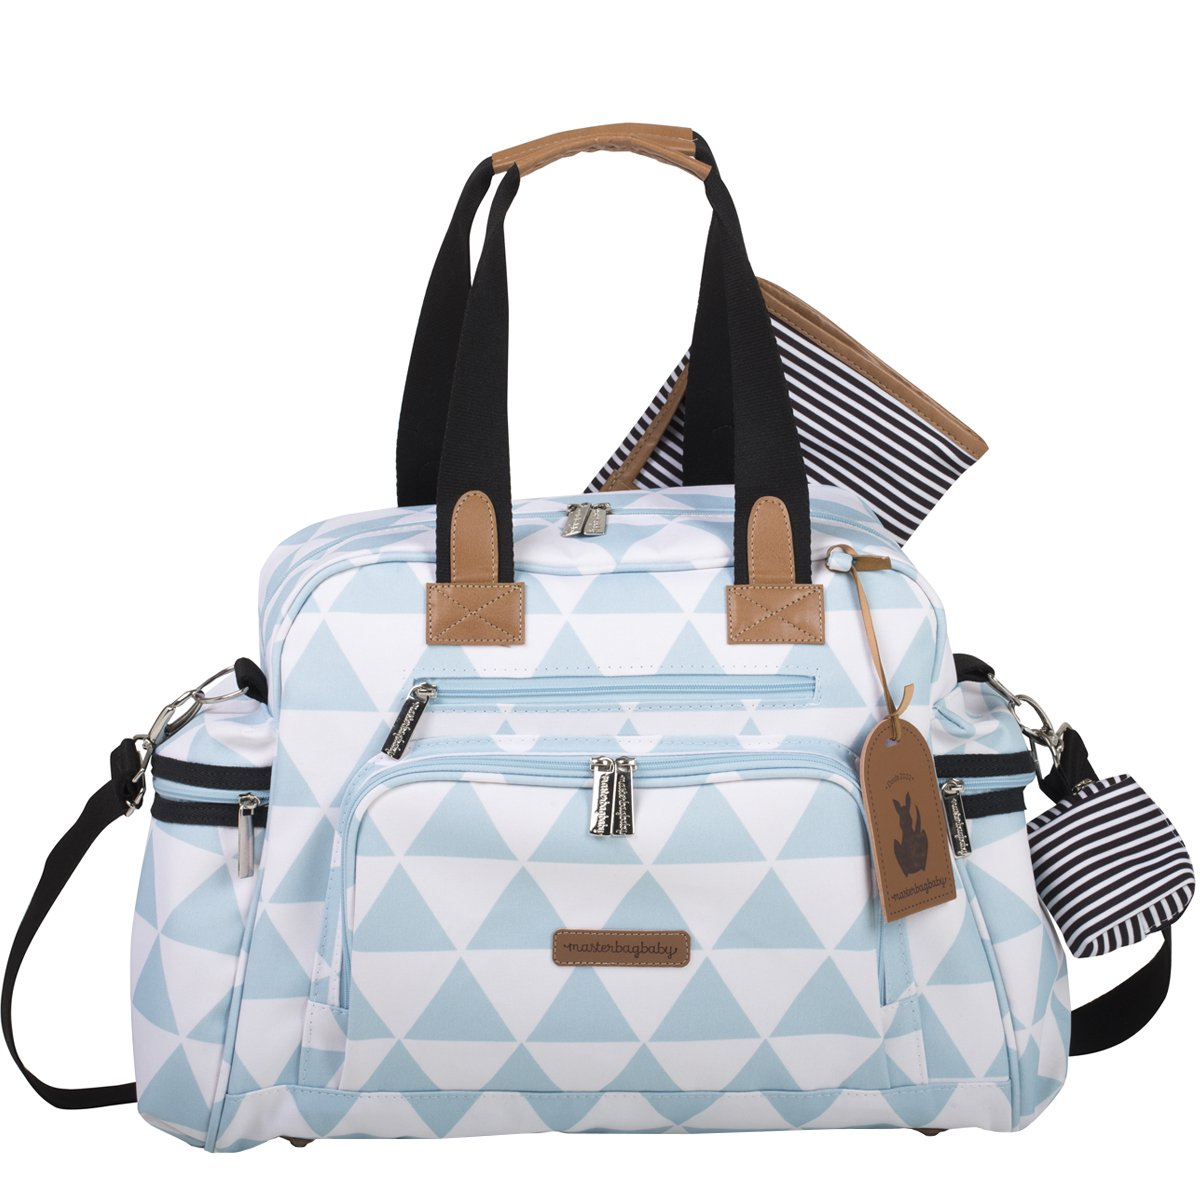 Bolsa Maternidade Everyday Manhattan Masterbag | Cor: Azul